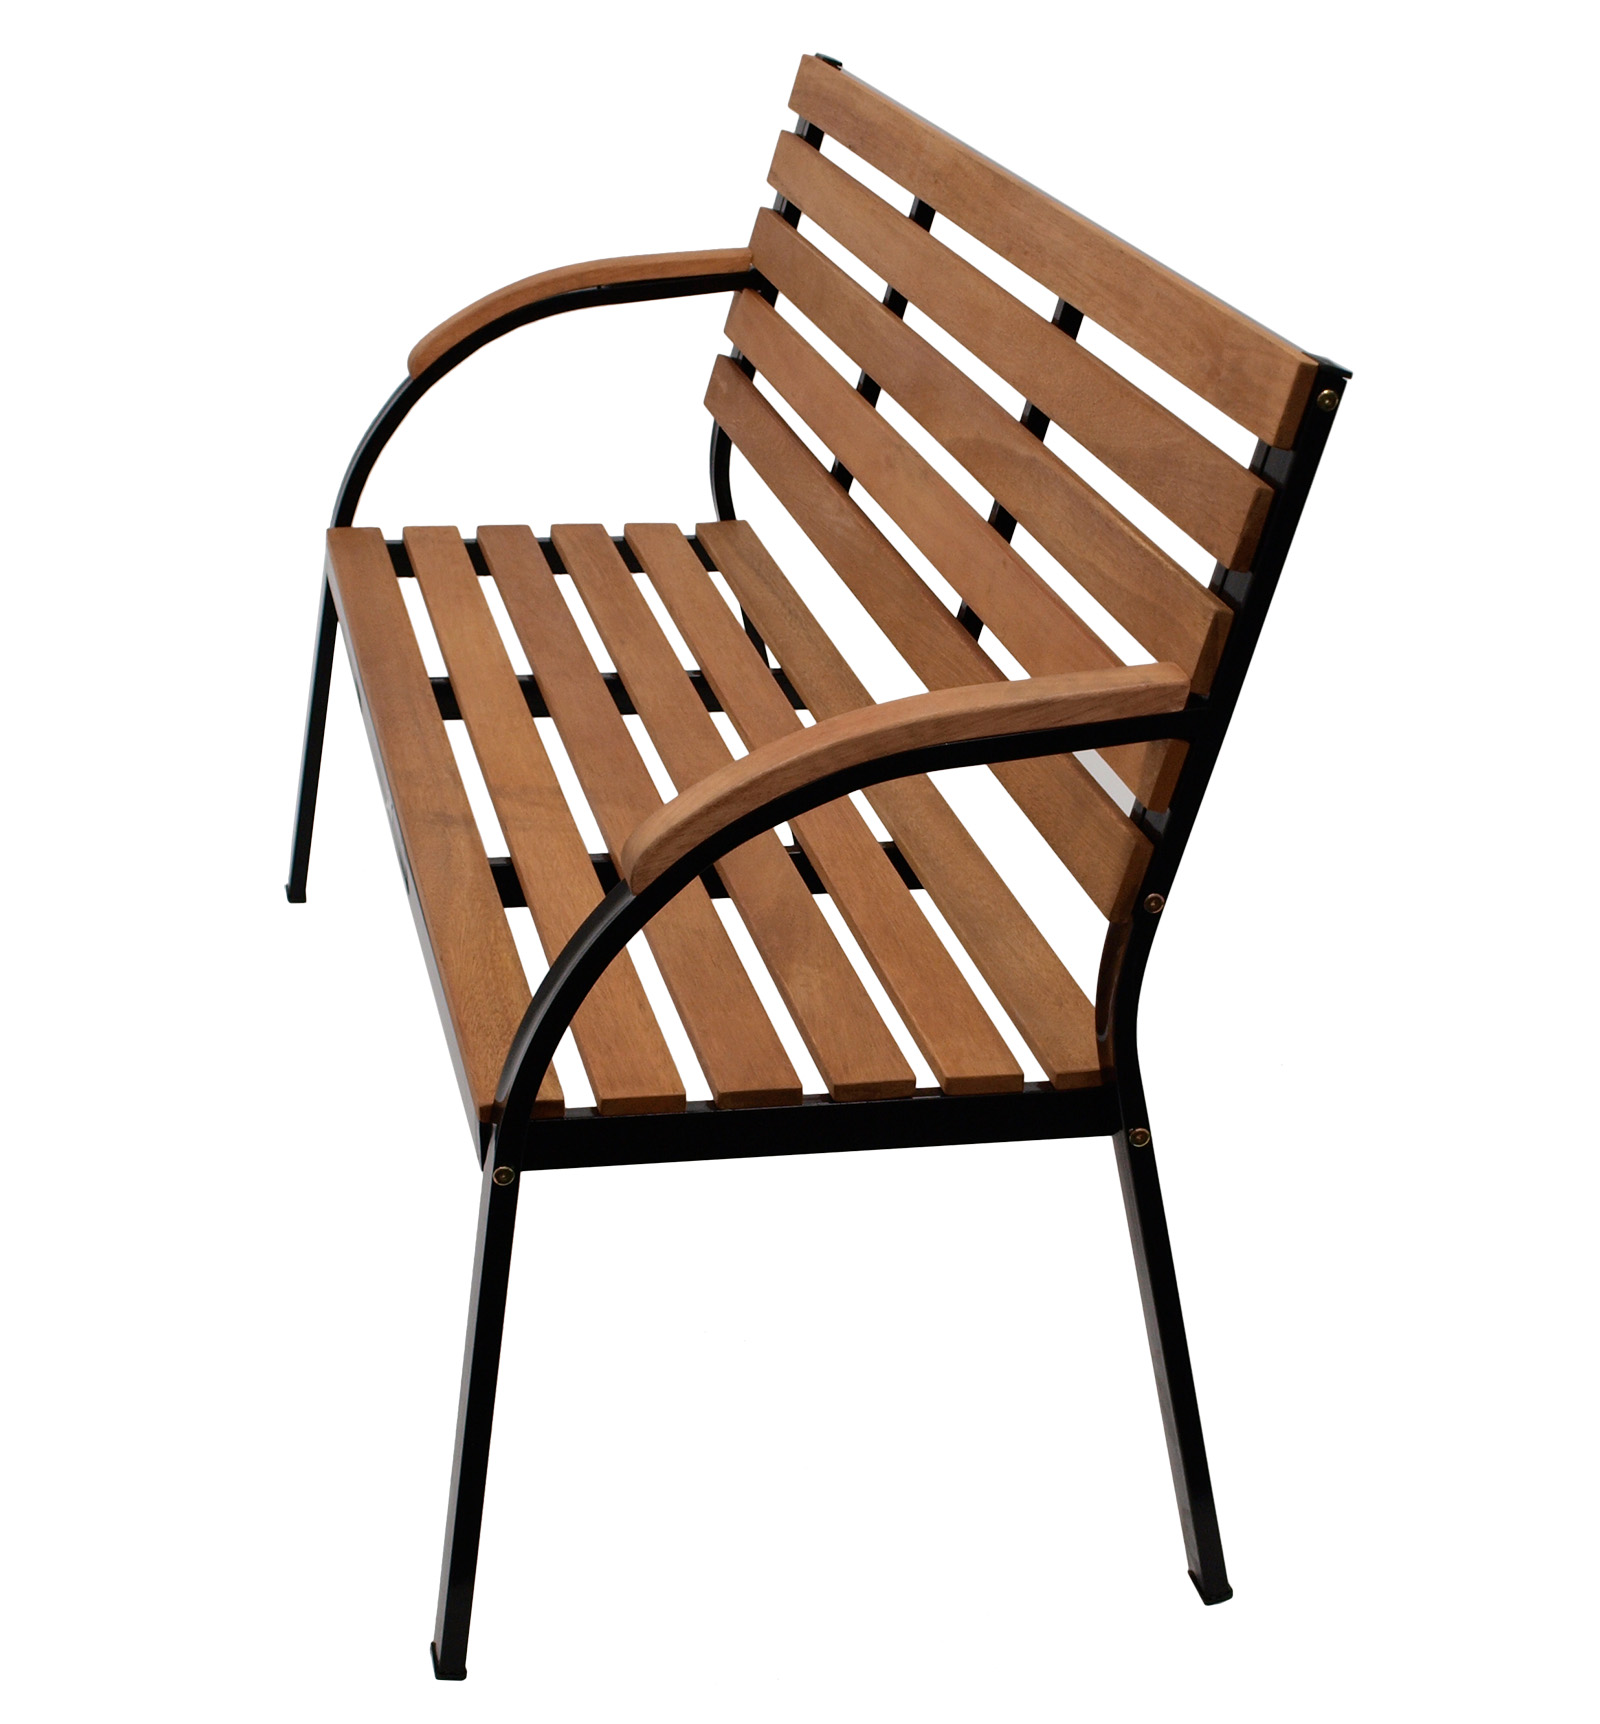 gartenbank parkbank sitzbank gartenm bel bank bolero 3 sitzer metall holz ebay. Black Bedroom Furniture Sets. Home Design Ideas